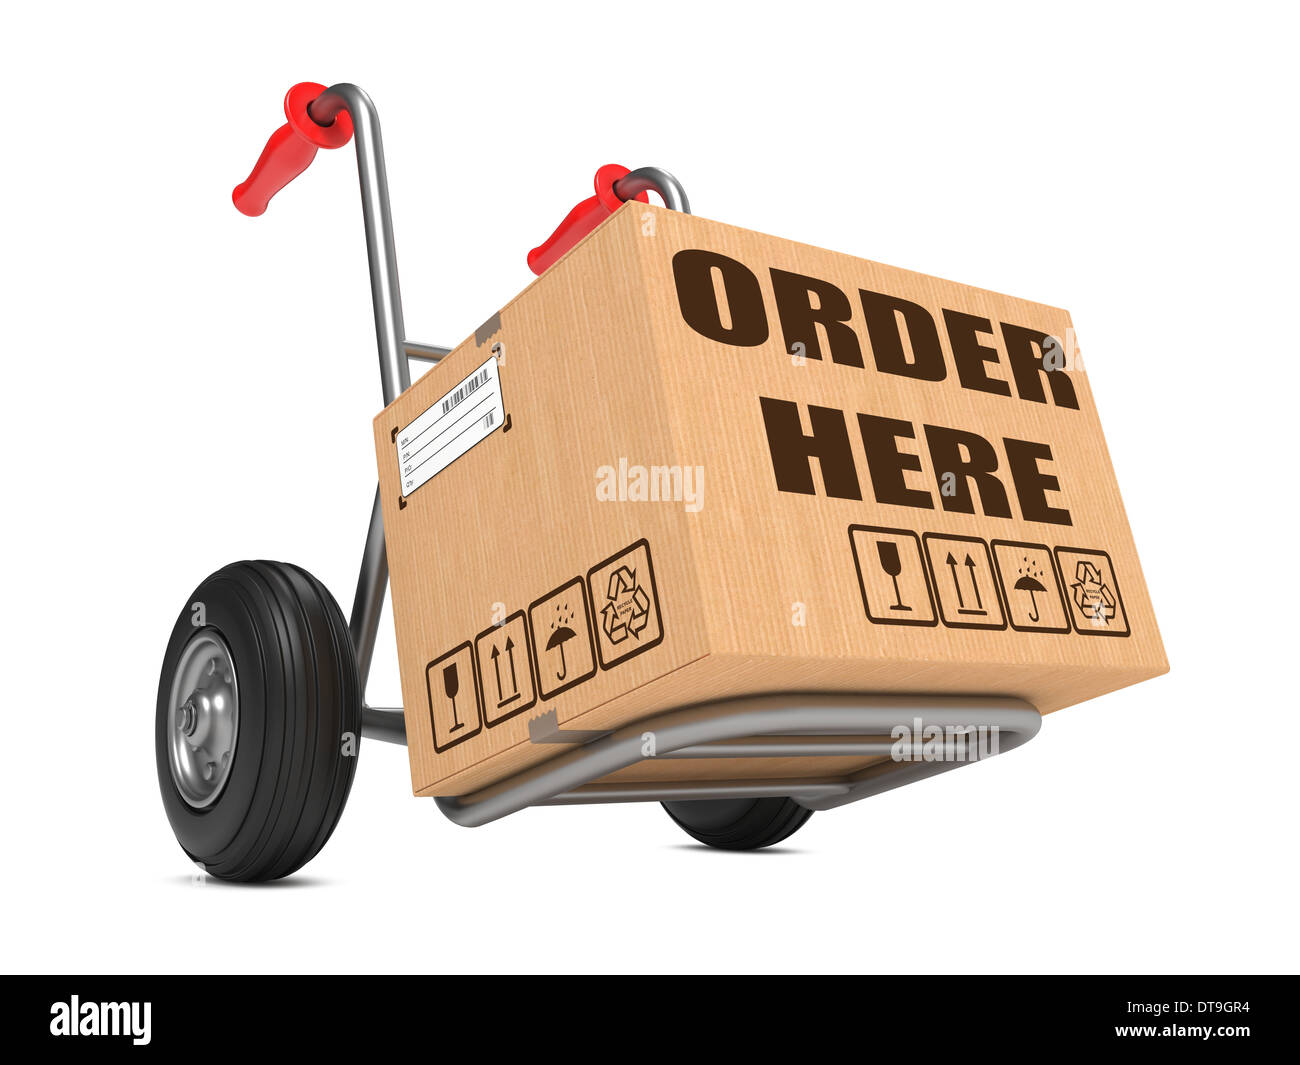 Order Here - Cardboard Box on Hand Truck. Stock Photo